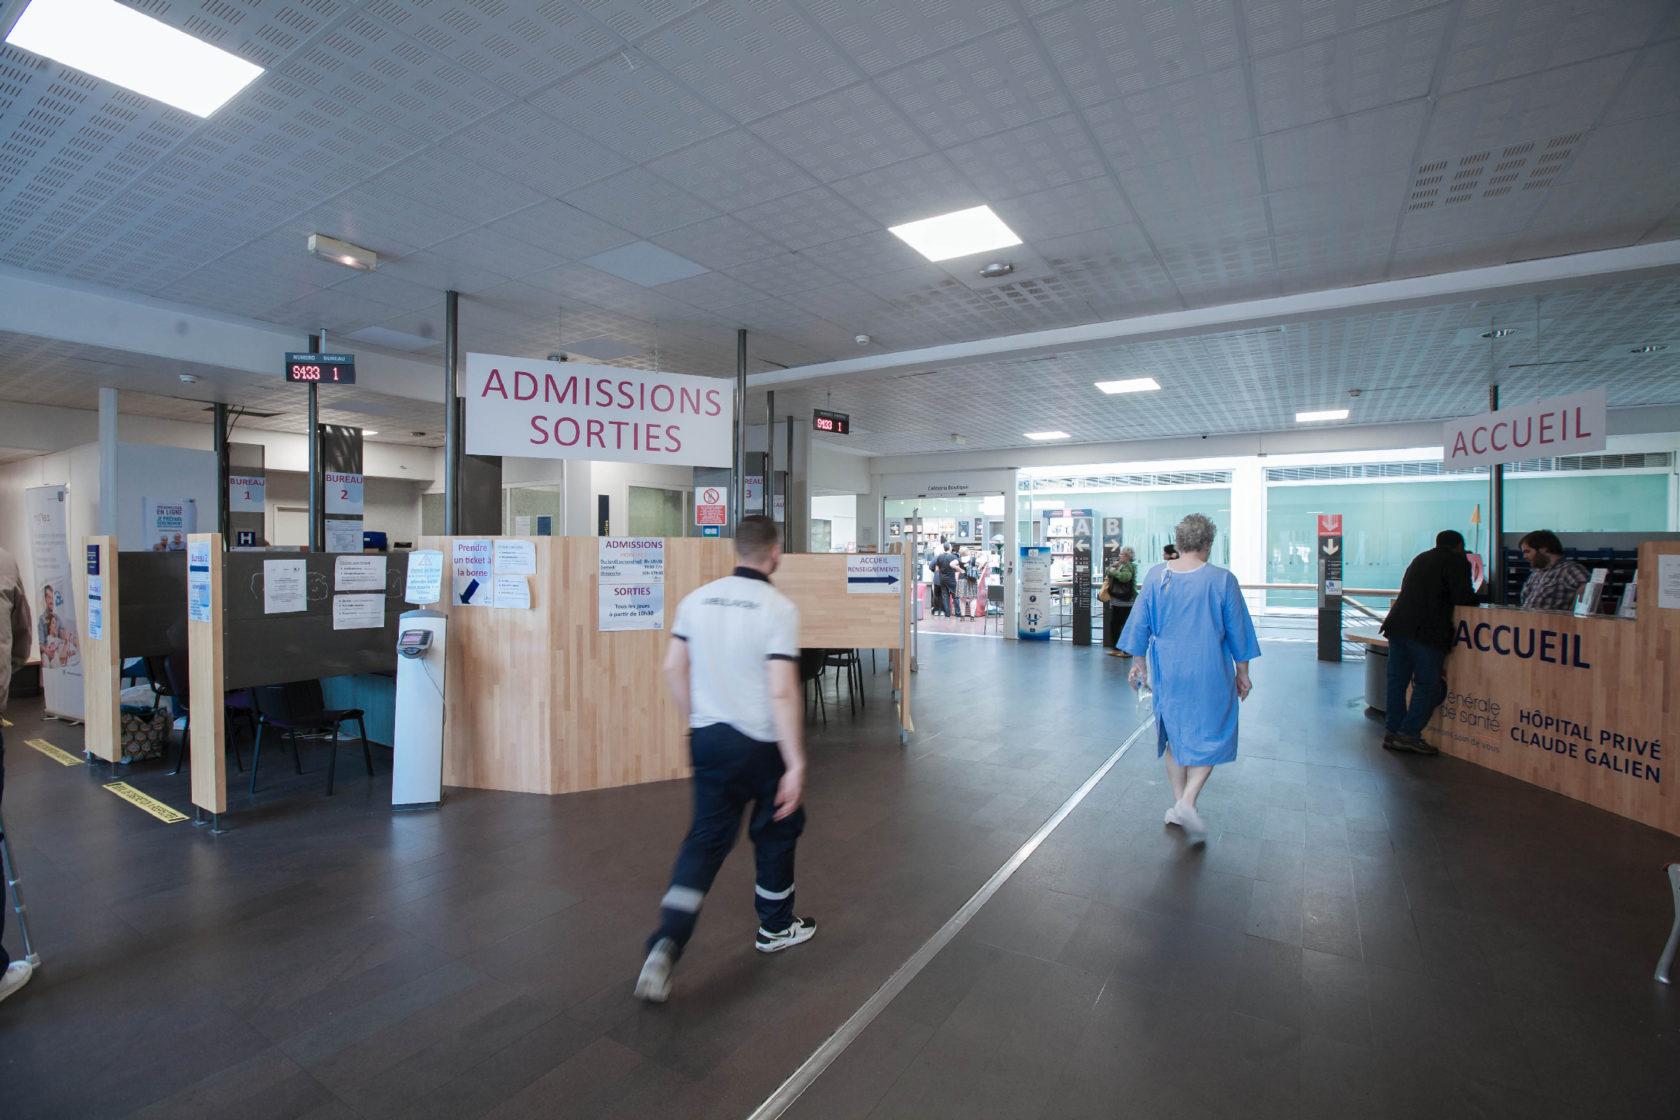 Accueil Hôpital Galienn, Quincy sous Sénart